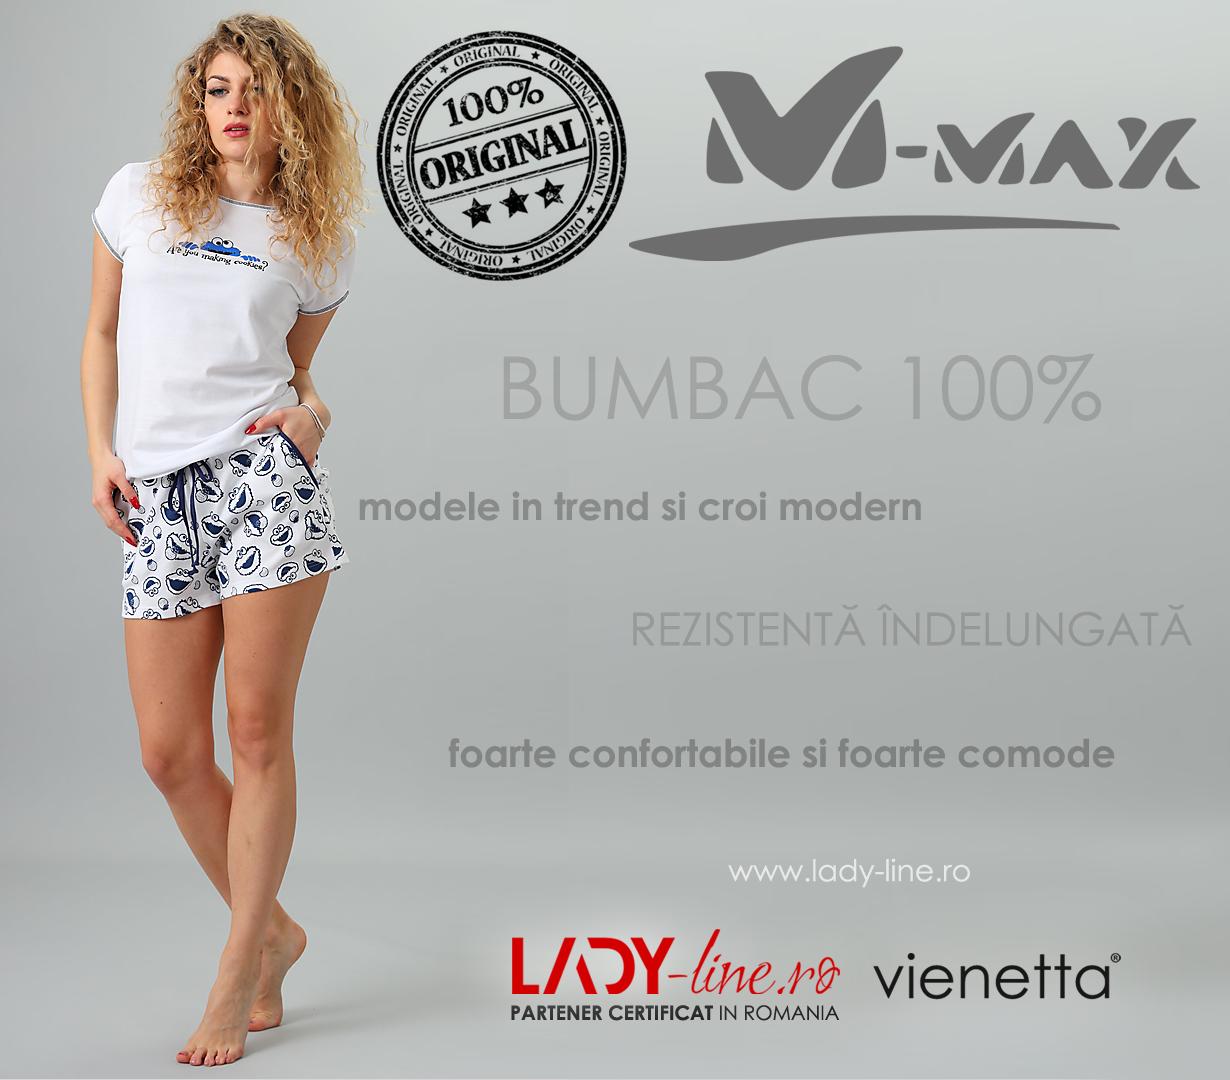 Pijamale Dama M-Max, Bumbac 100%, 'Making Cookies'